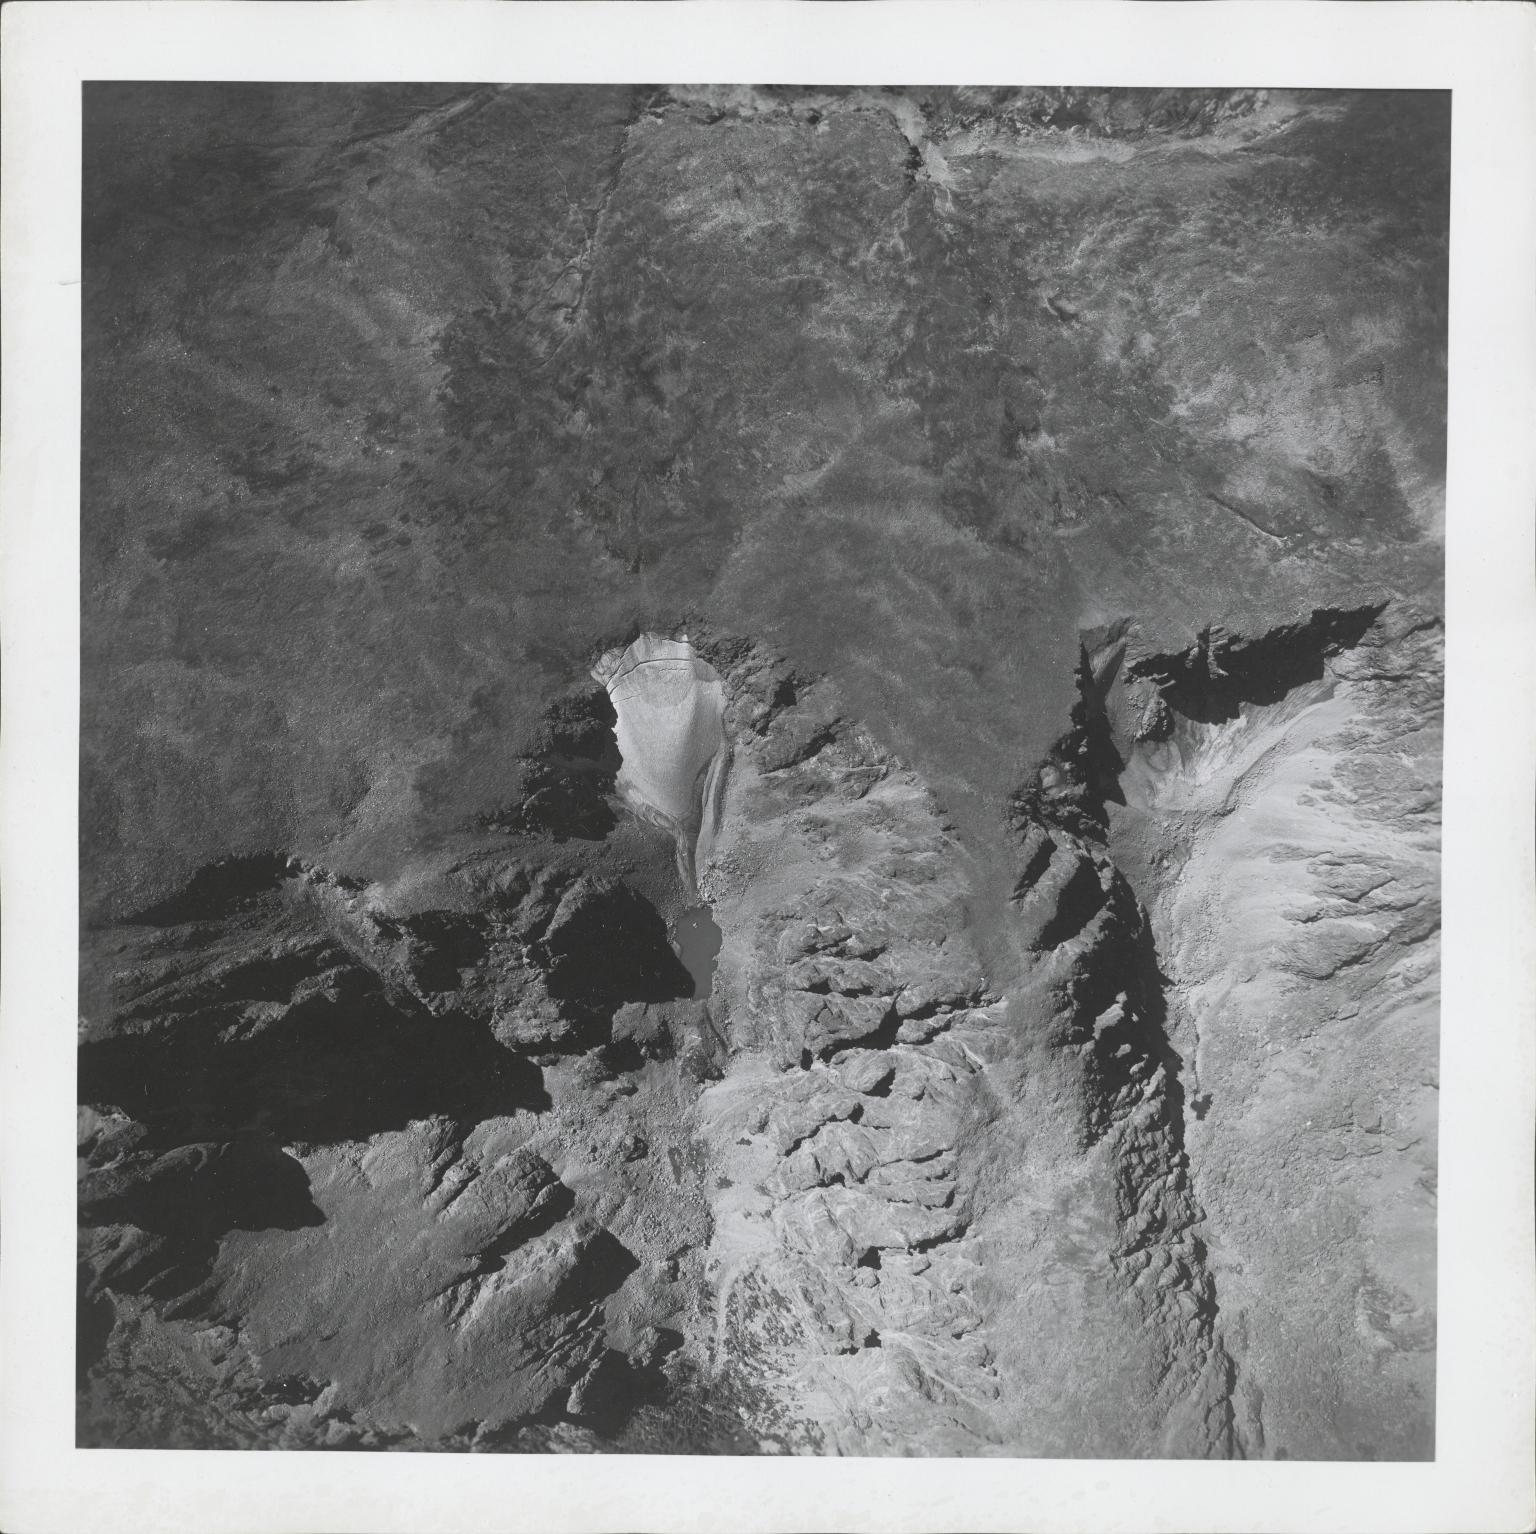 Tyndall Glacier, aerial photograph FAM 3120 6 Colorado